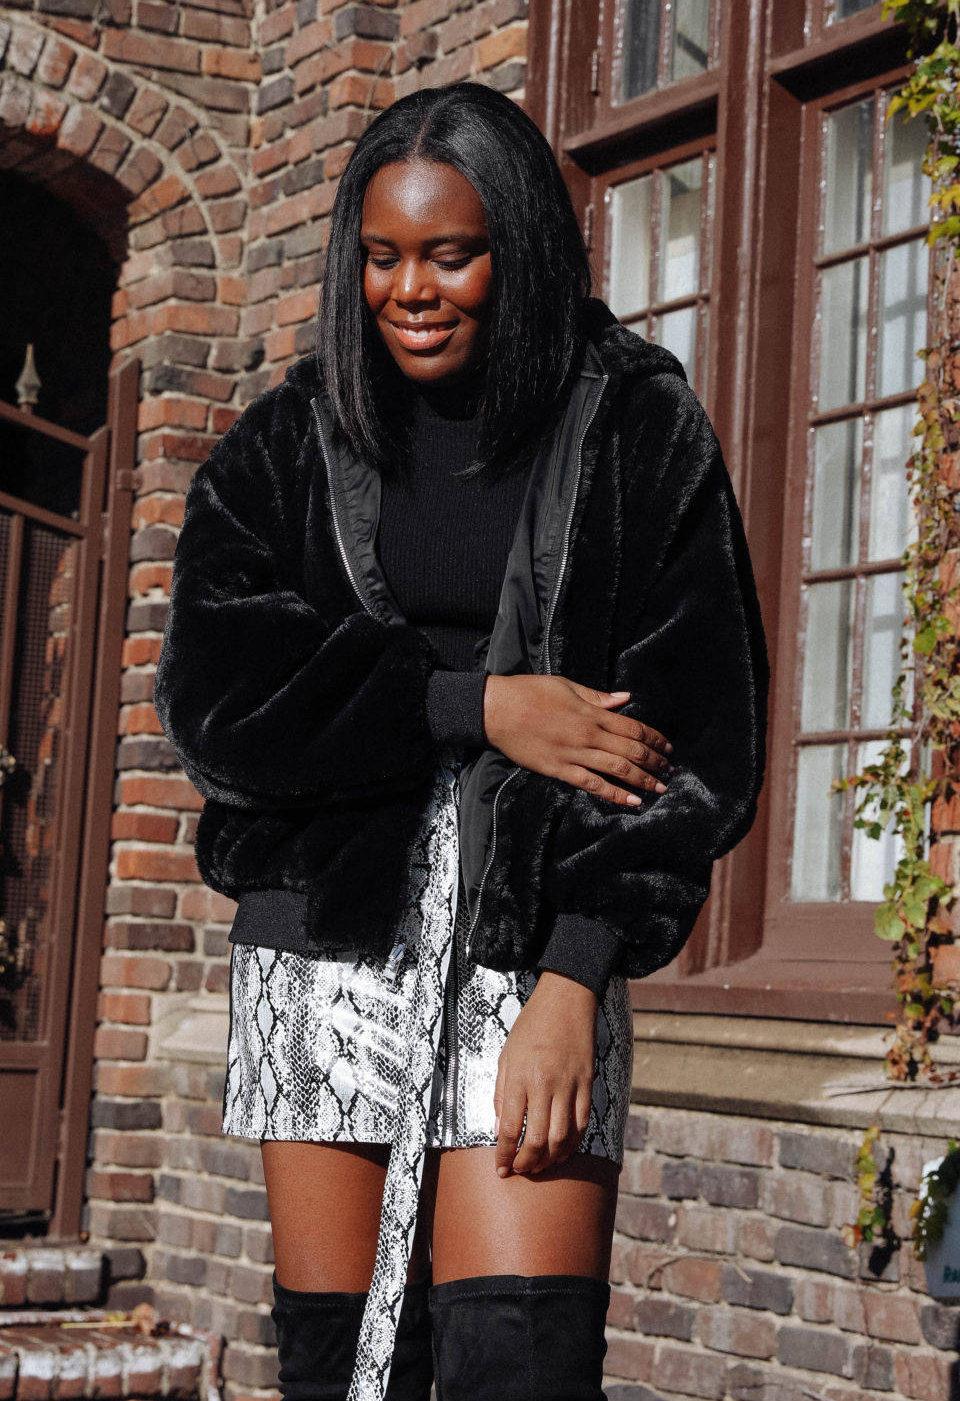 Snake Print Fashion Trend 2020 - Le Fab Chic